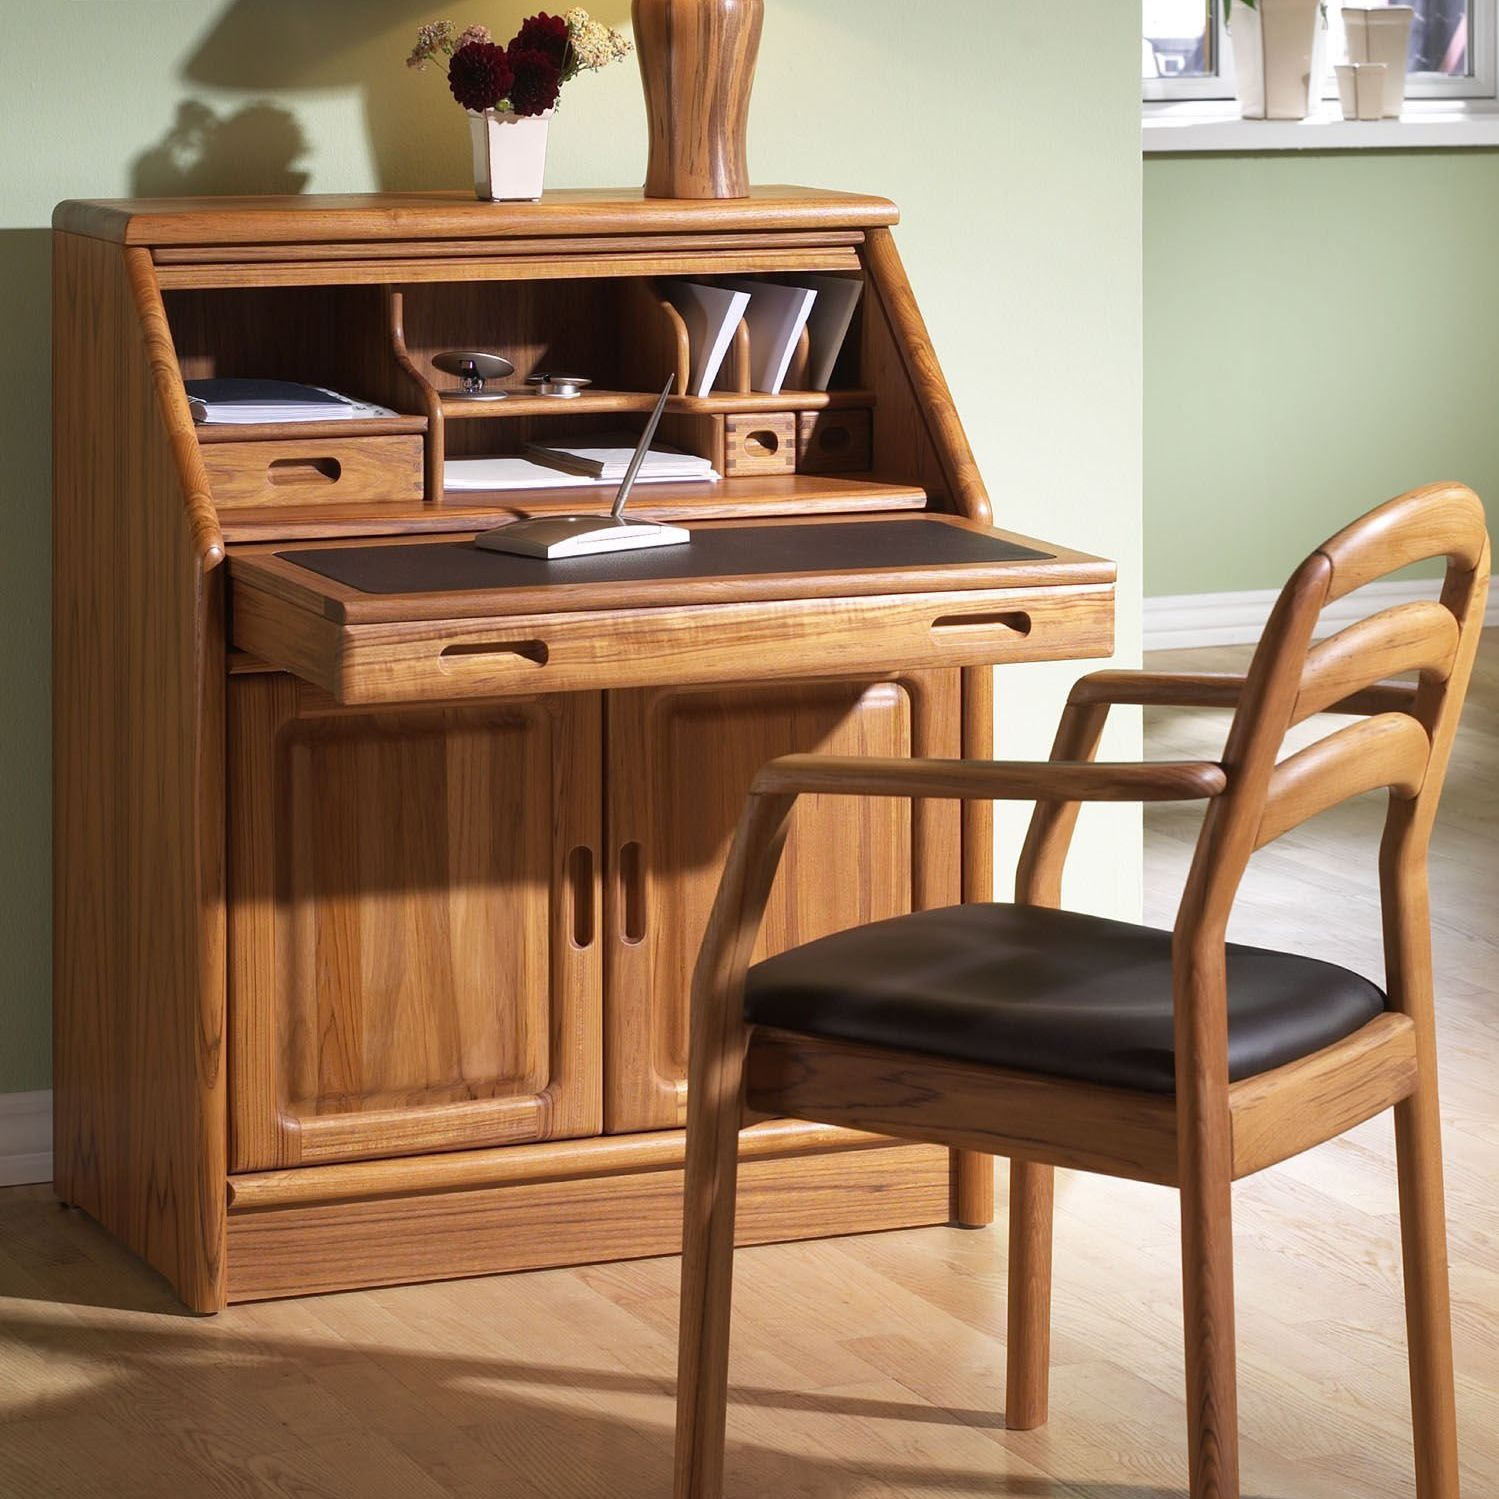 Contemporary Secretary Desk Wooden 1152m Dyrlund Videos # Muebles Secreter